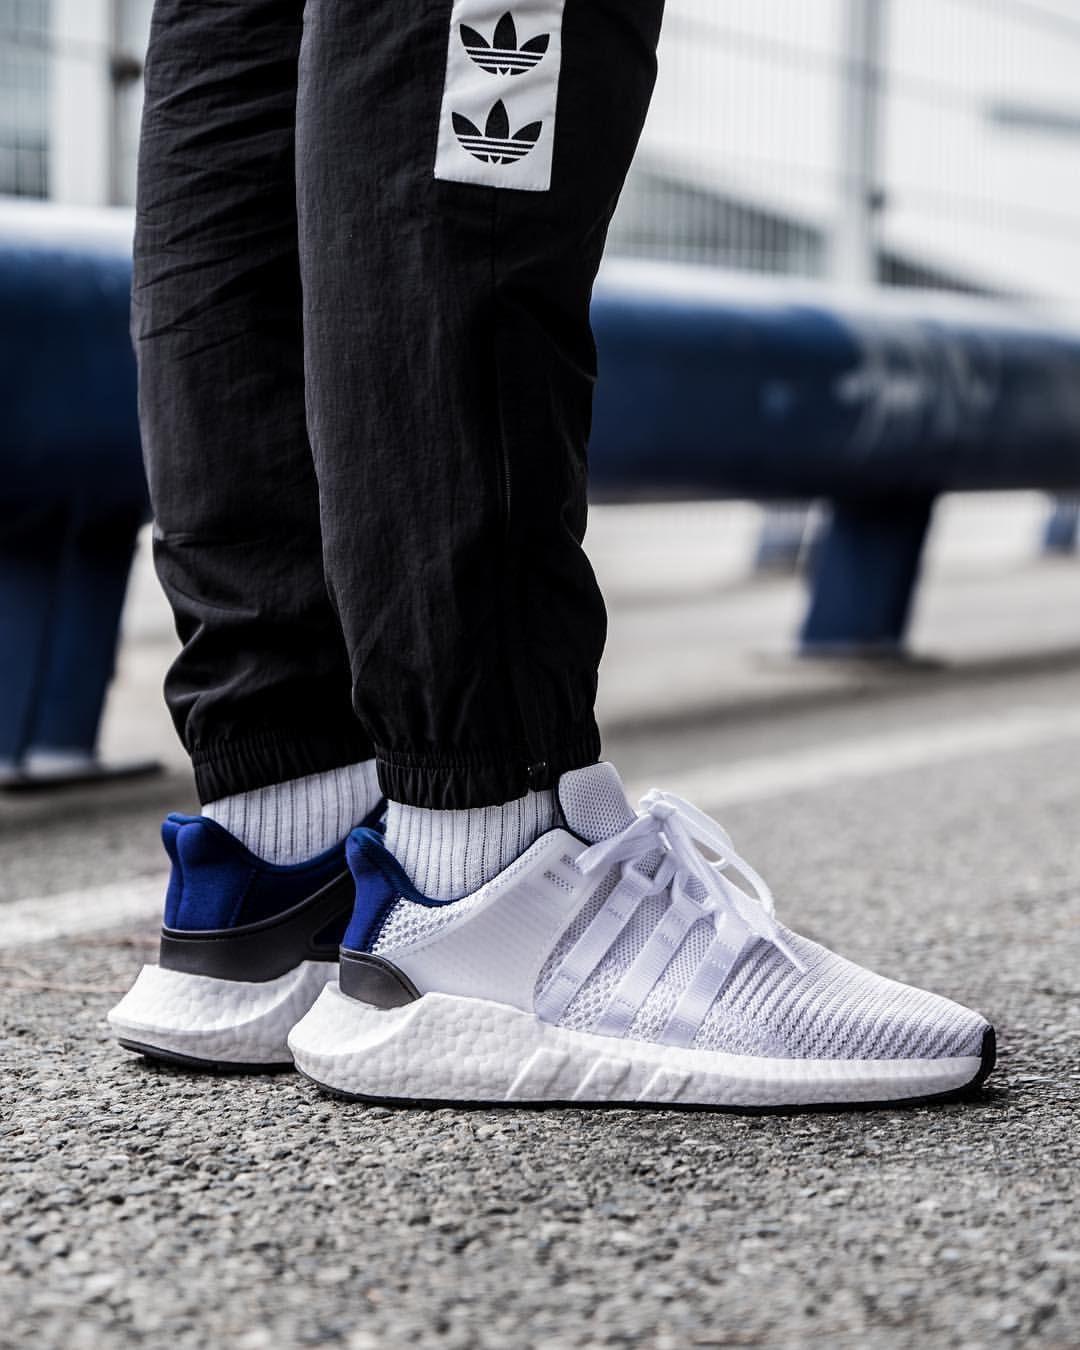 Adidas eqt sostegno 93 / 17 scarpe eva pinterest